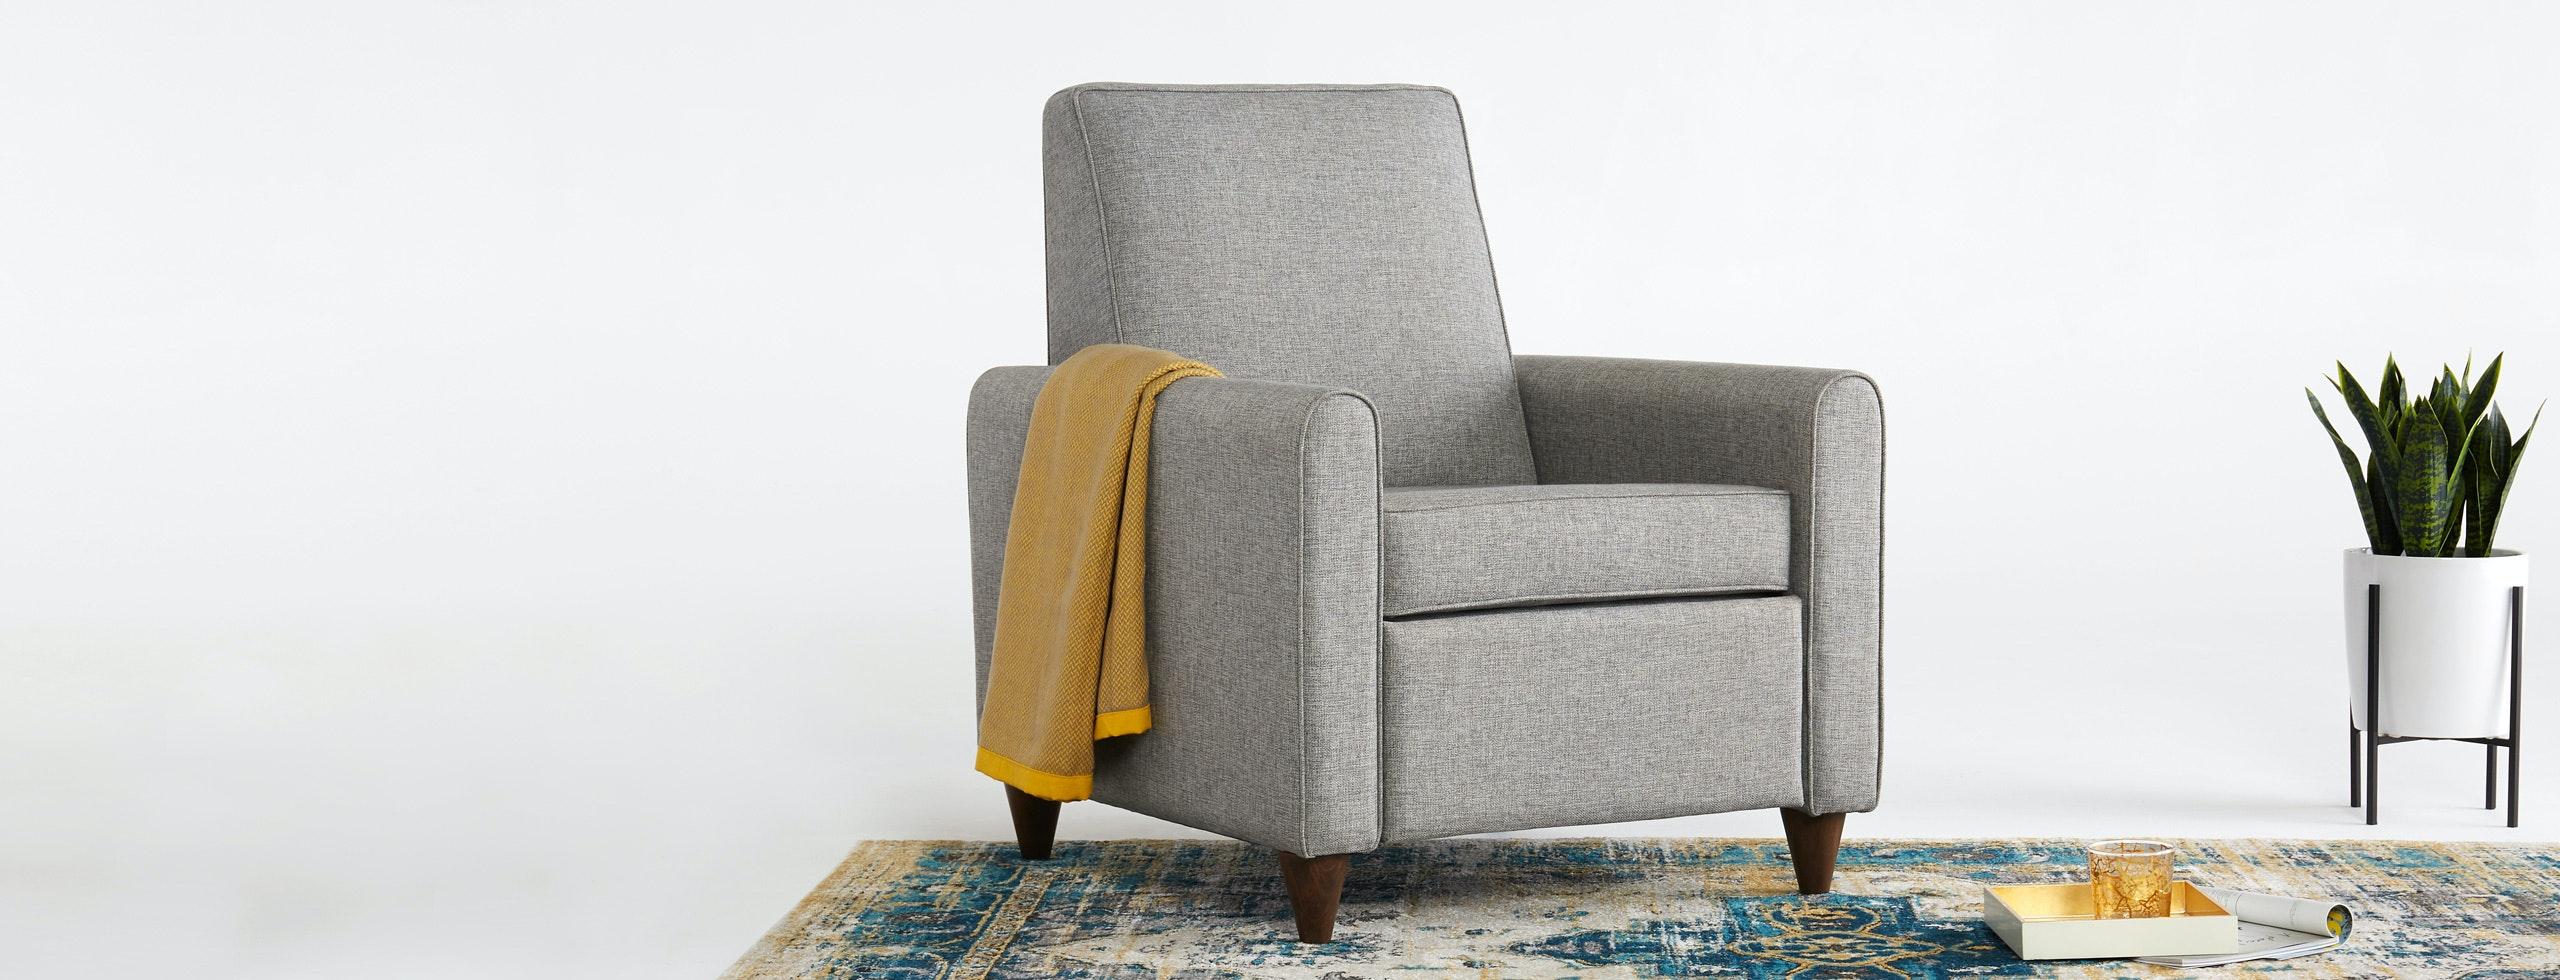 Ellison Recliner Chair